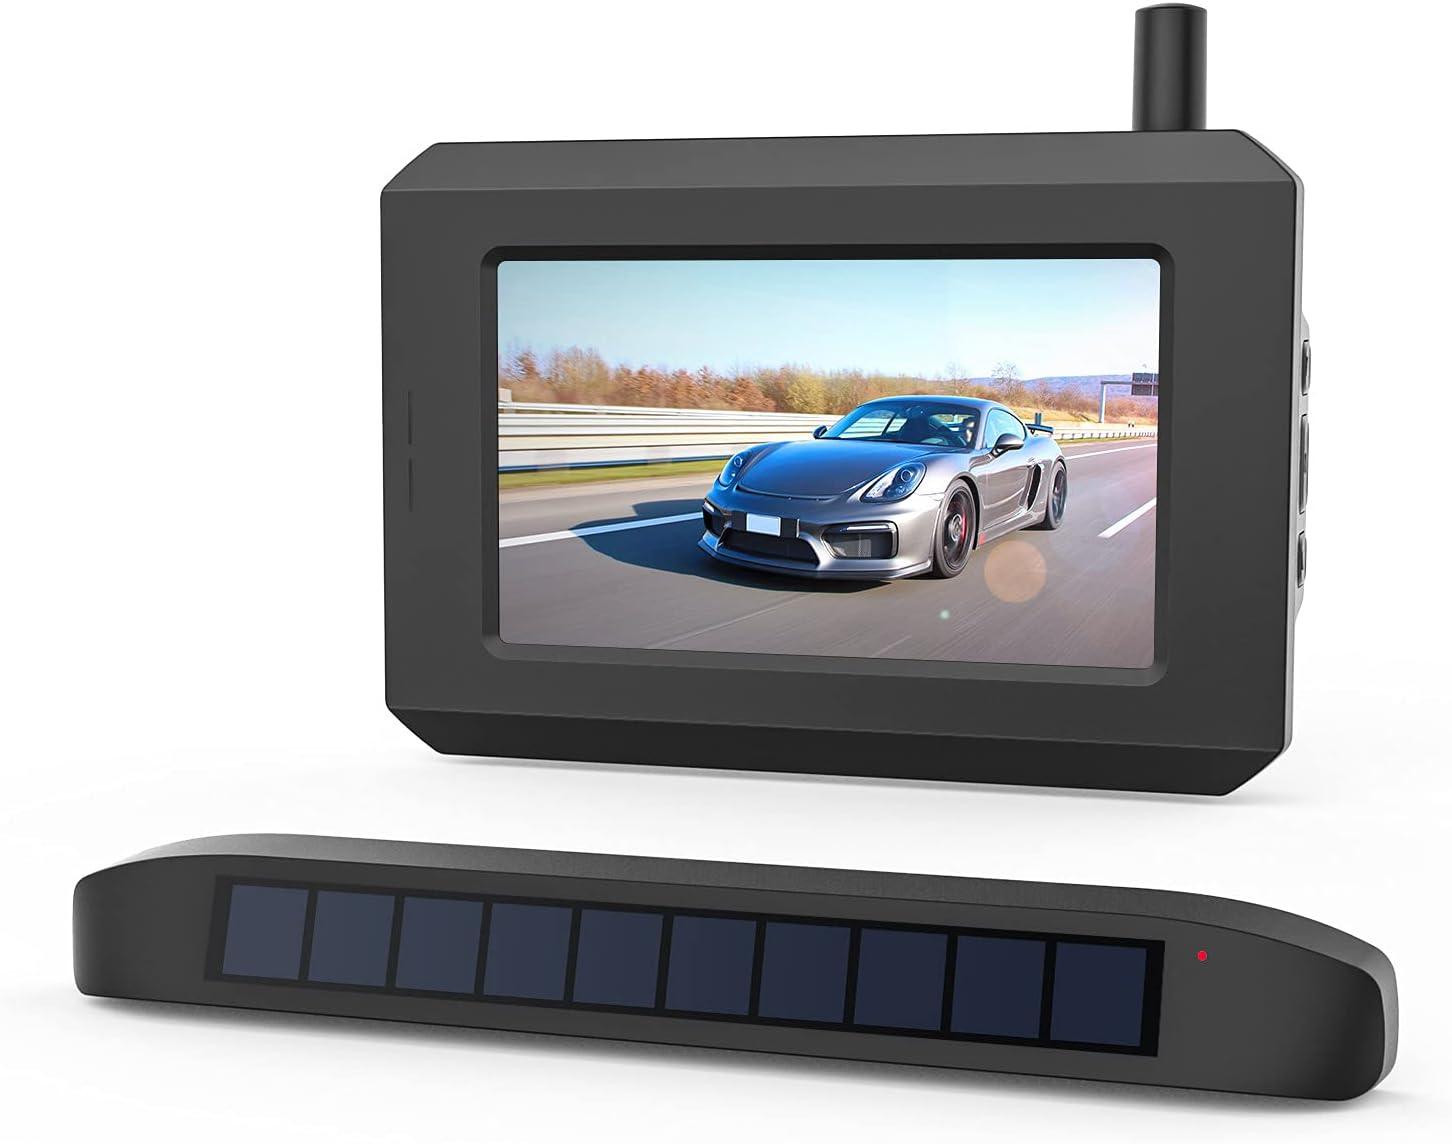 Boscam Solar Digital Wireless Backup Camera $105.99 Coupon